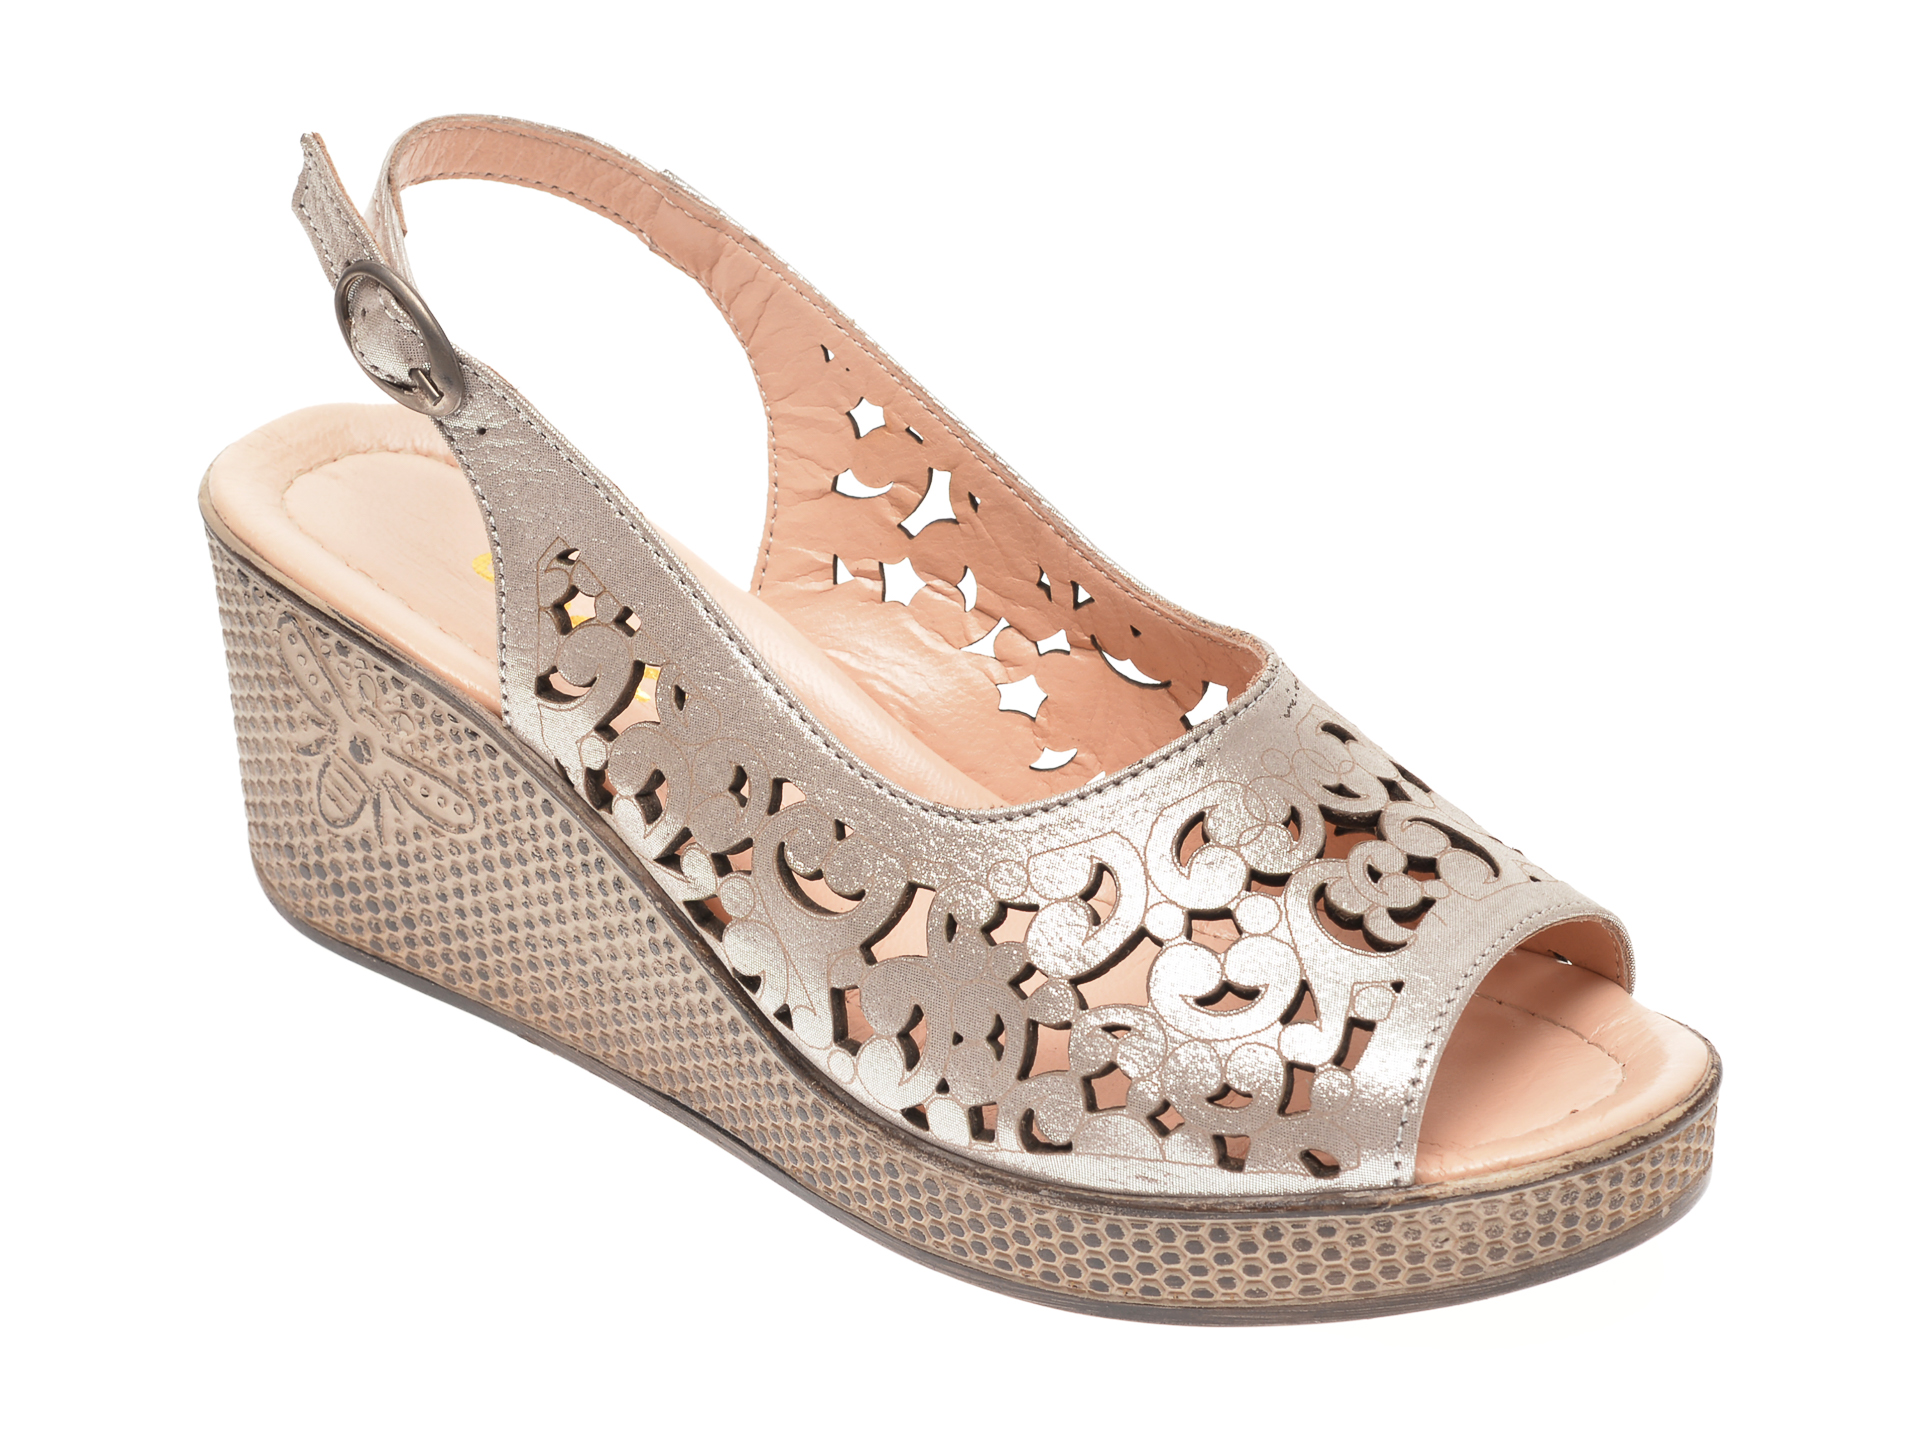 Sandale ENDICAN maro, K1211, din piele naturala